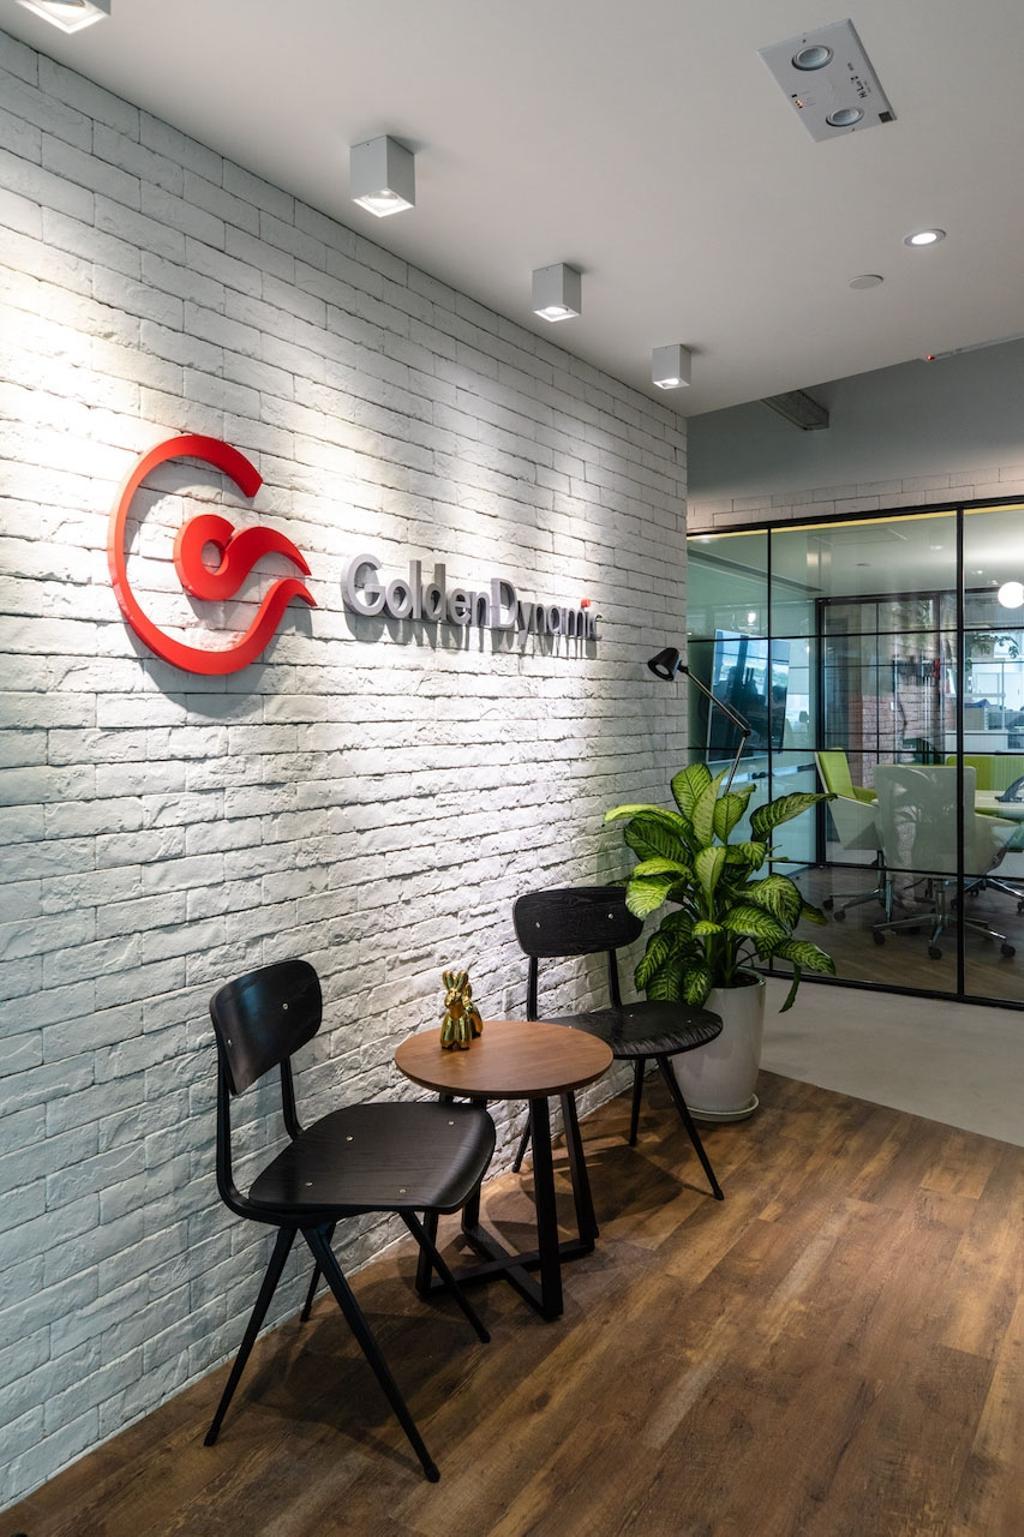 Golden Dynamic Enterprise, 商用, 室內設計師, MAD Studio Limited, 北歐